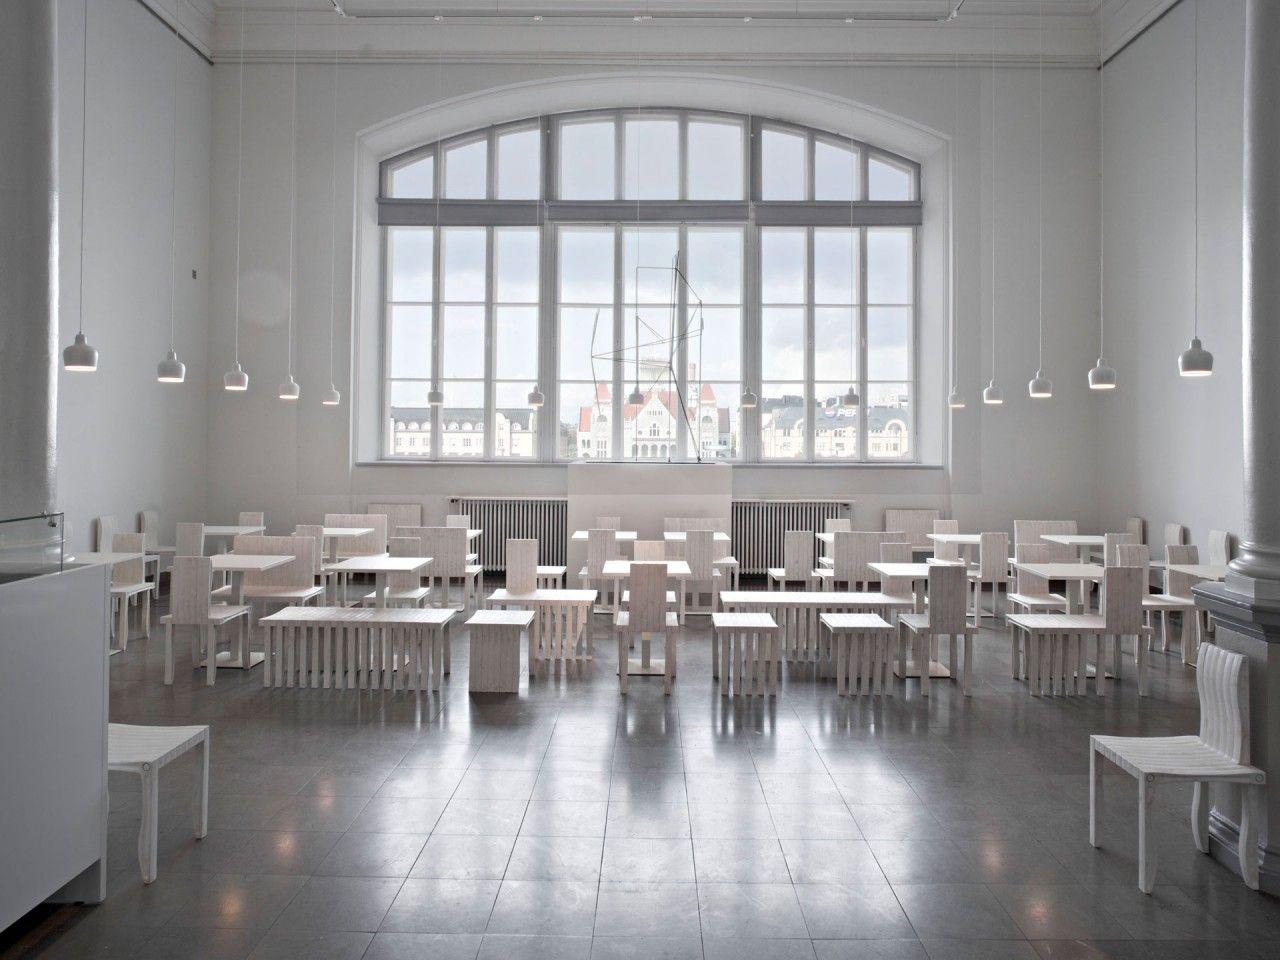 Alvar aalto house interior cafe cubus ateneum helsinki finland  resturants and bars